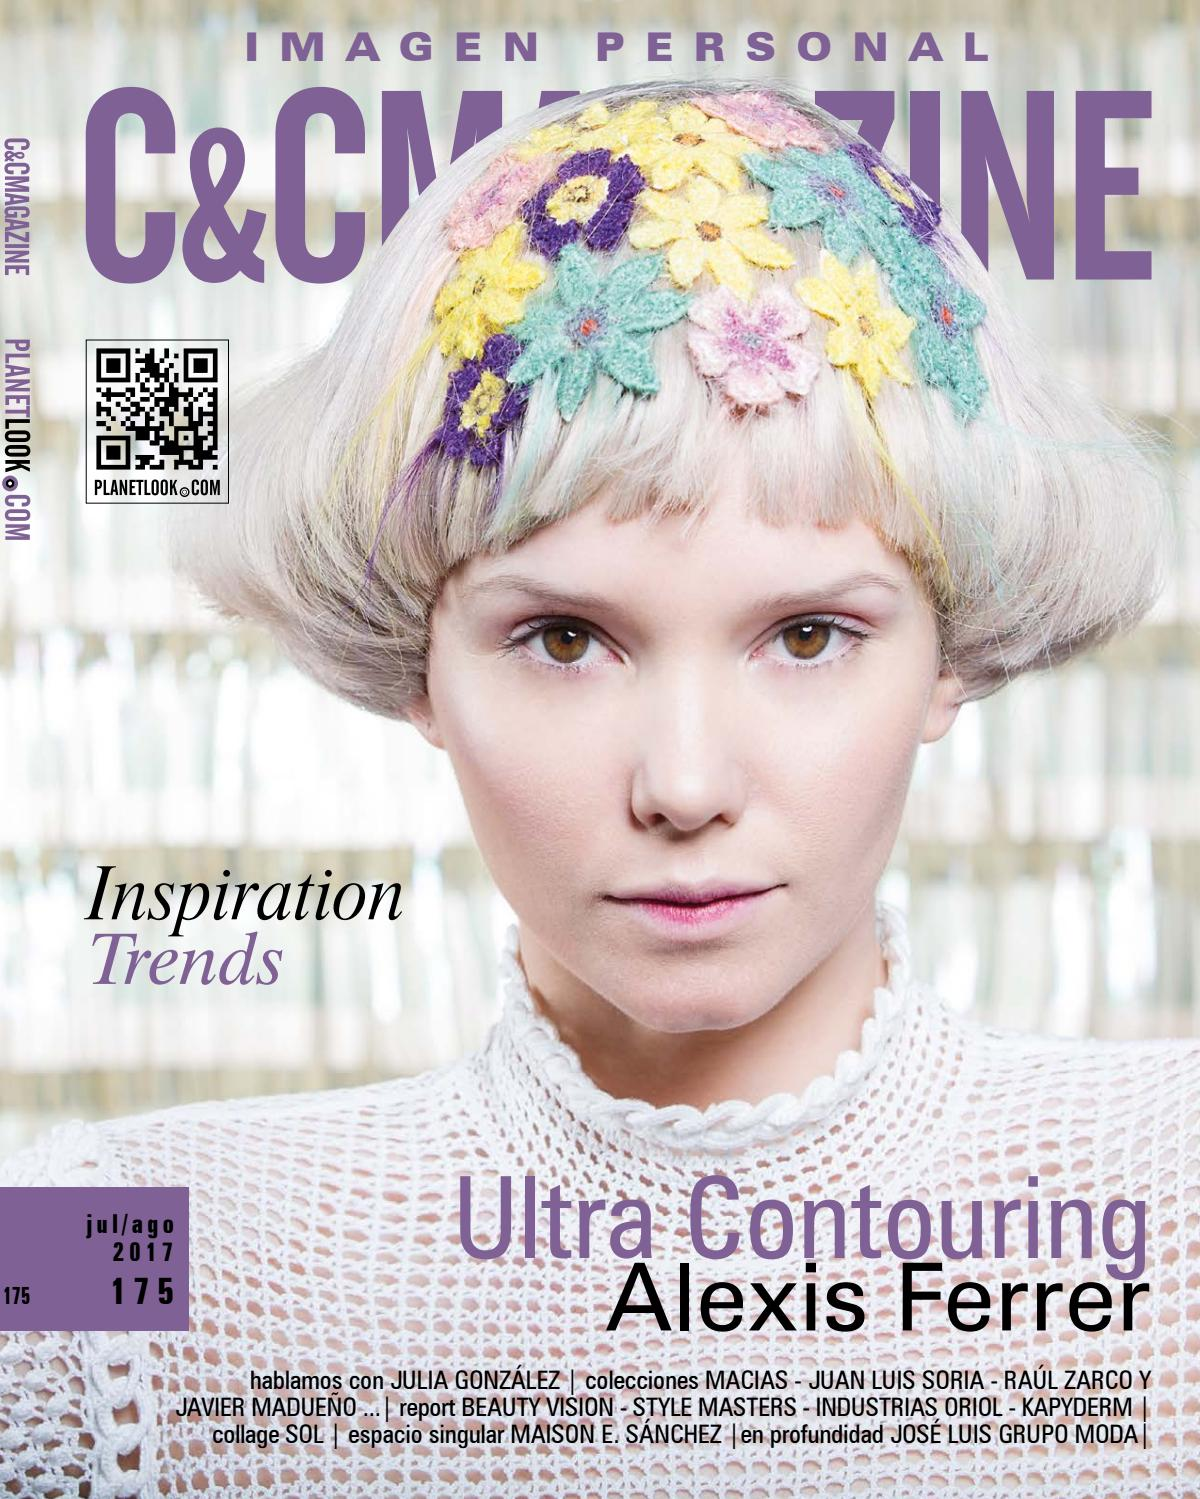 044d45c364 175ccmagazine by C&C Magazine - issuu